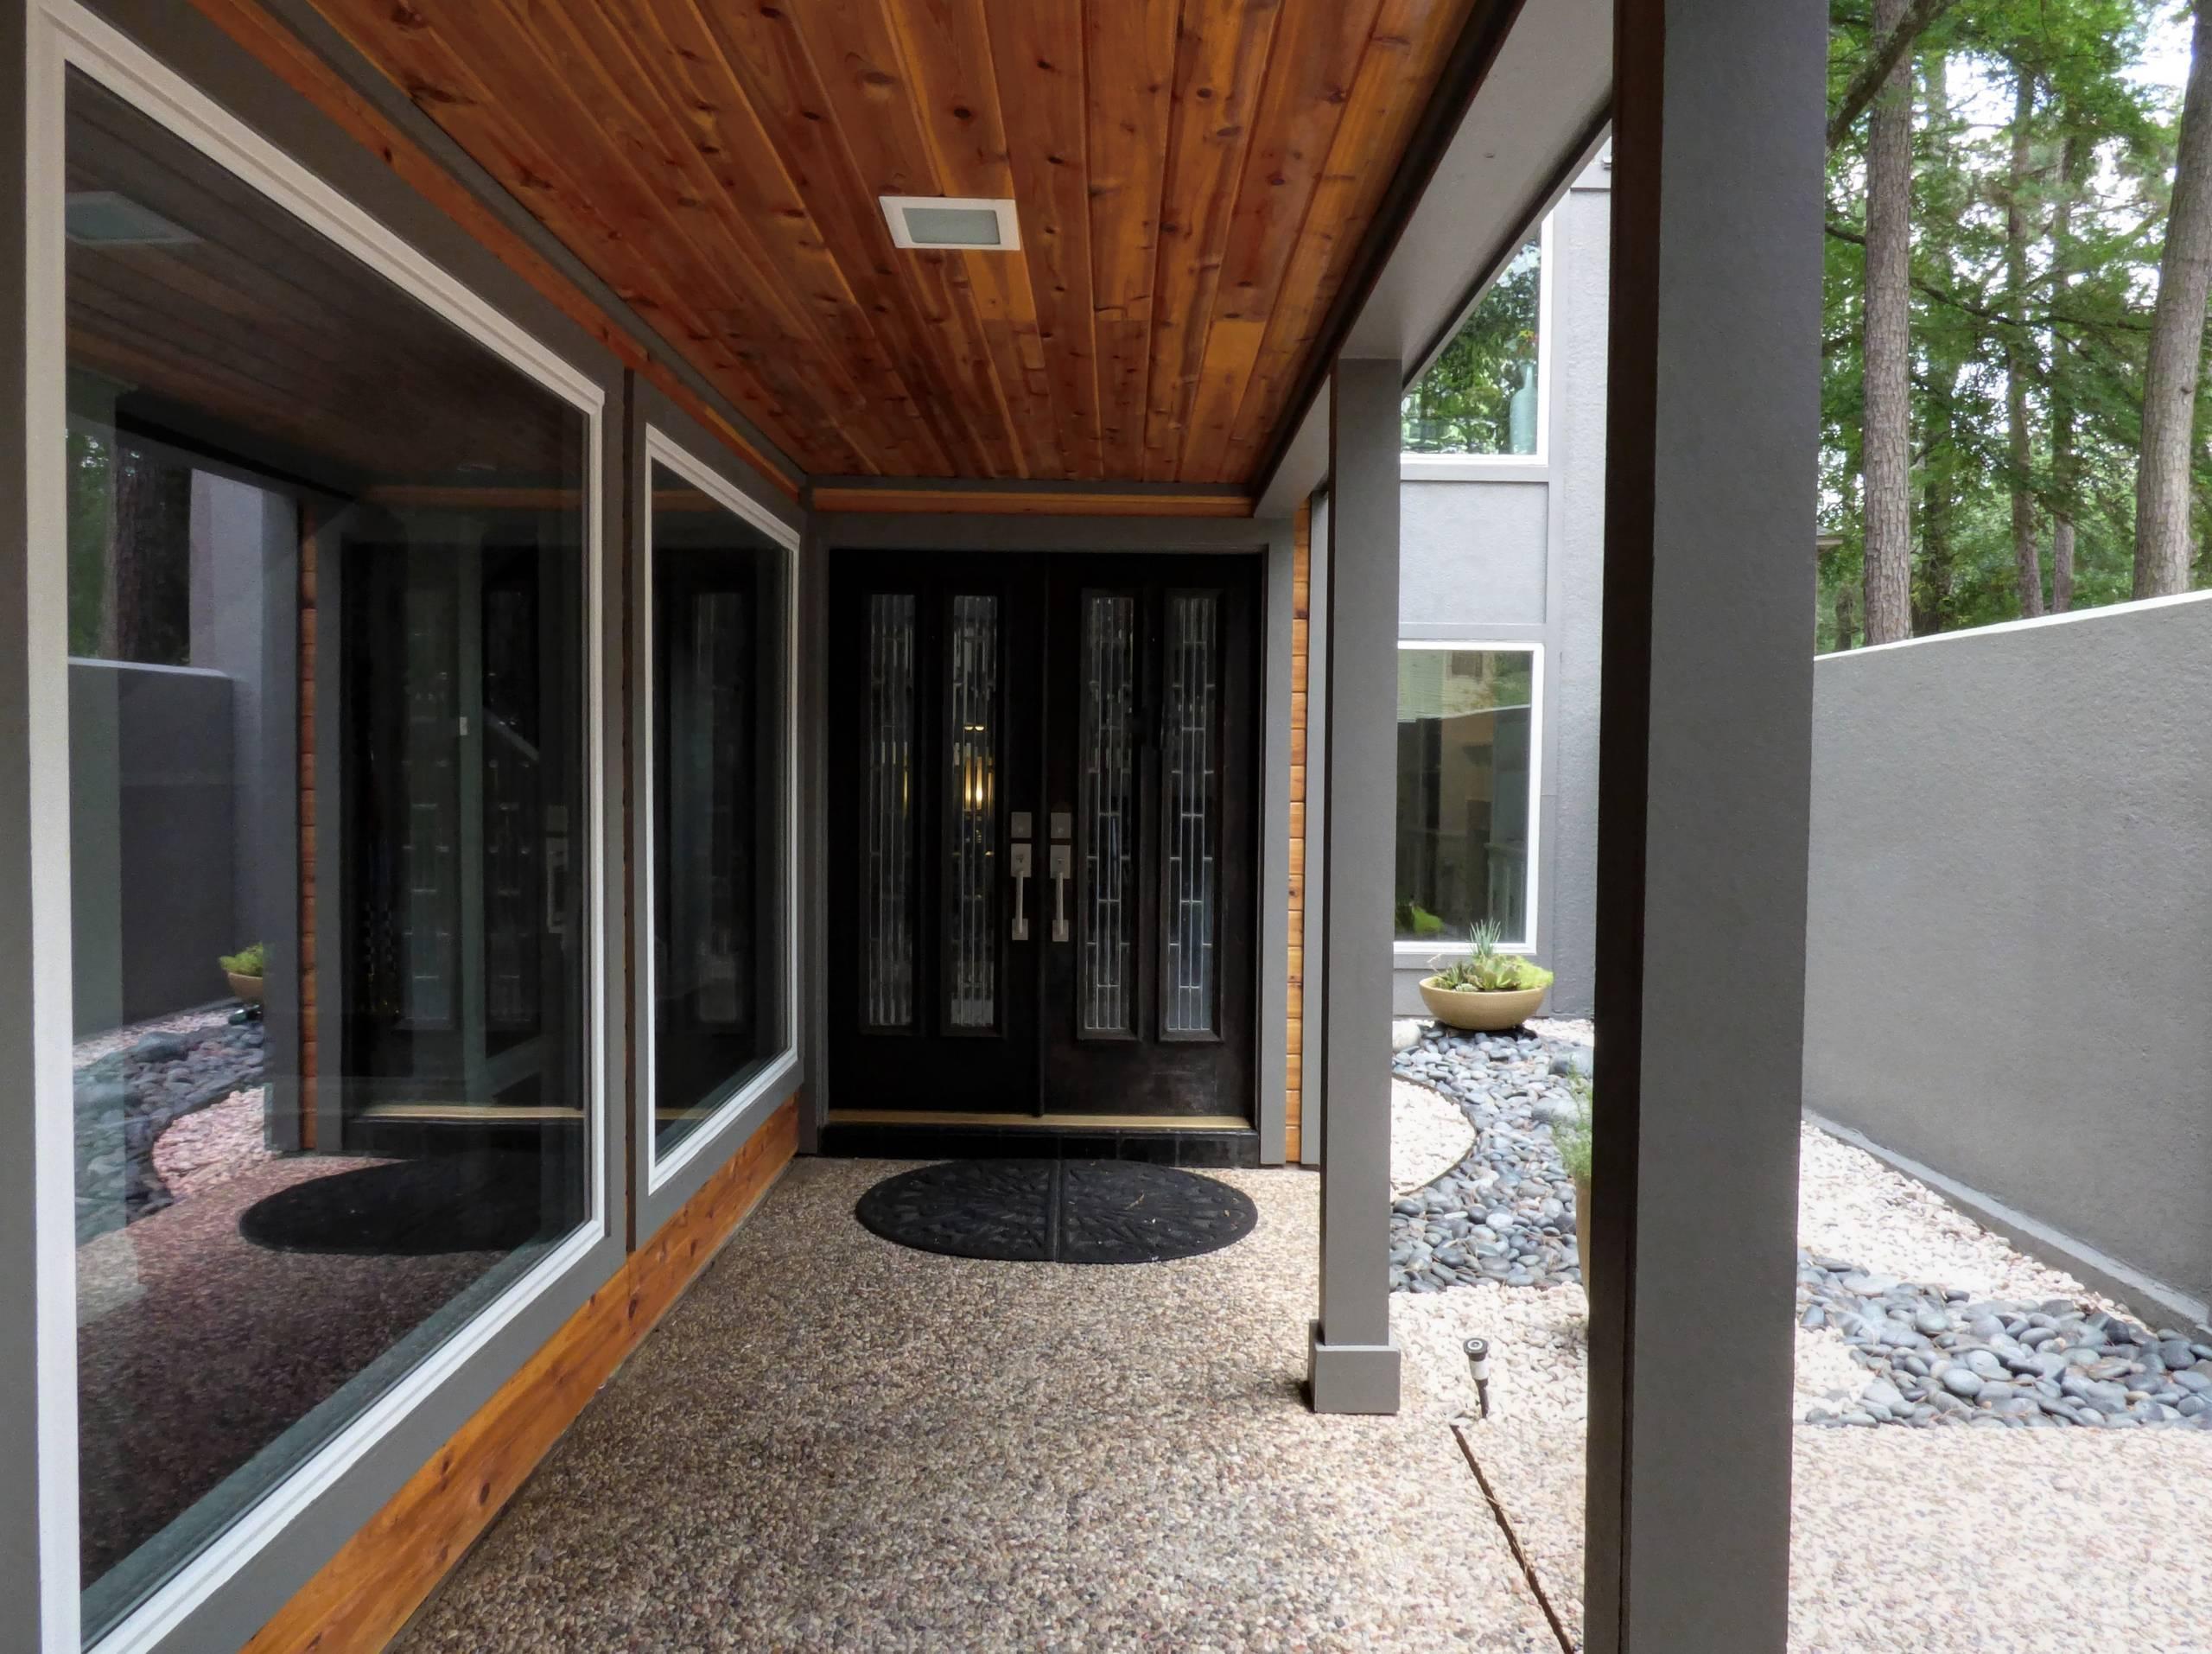 Modern Design - Cedar T & G, Stained with James Hardie trim